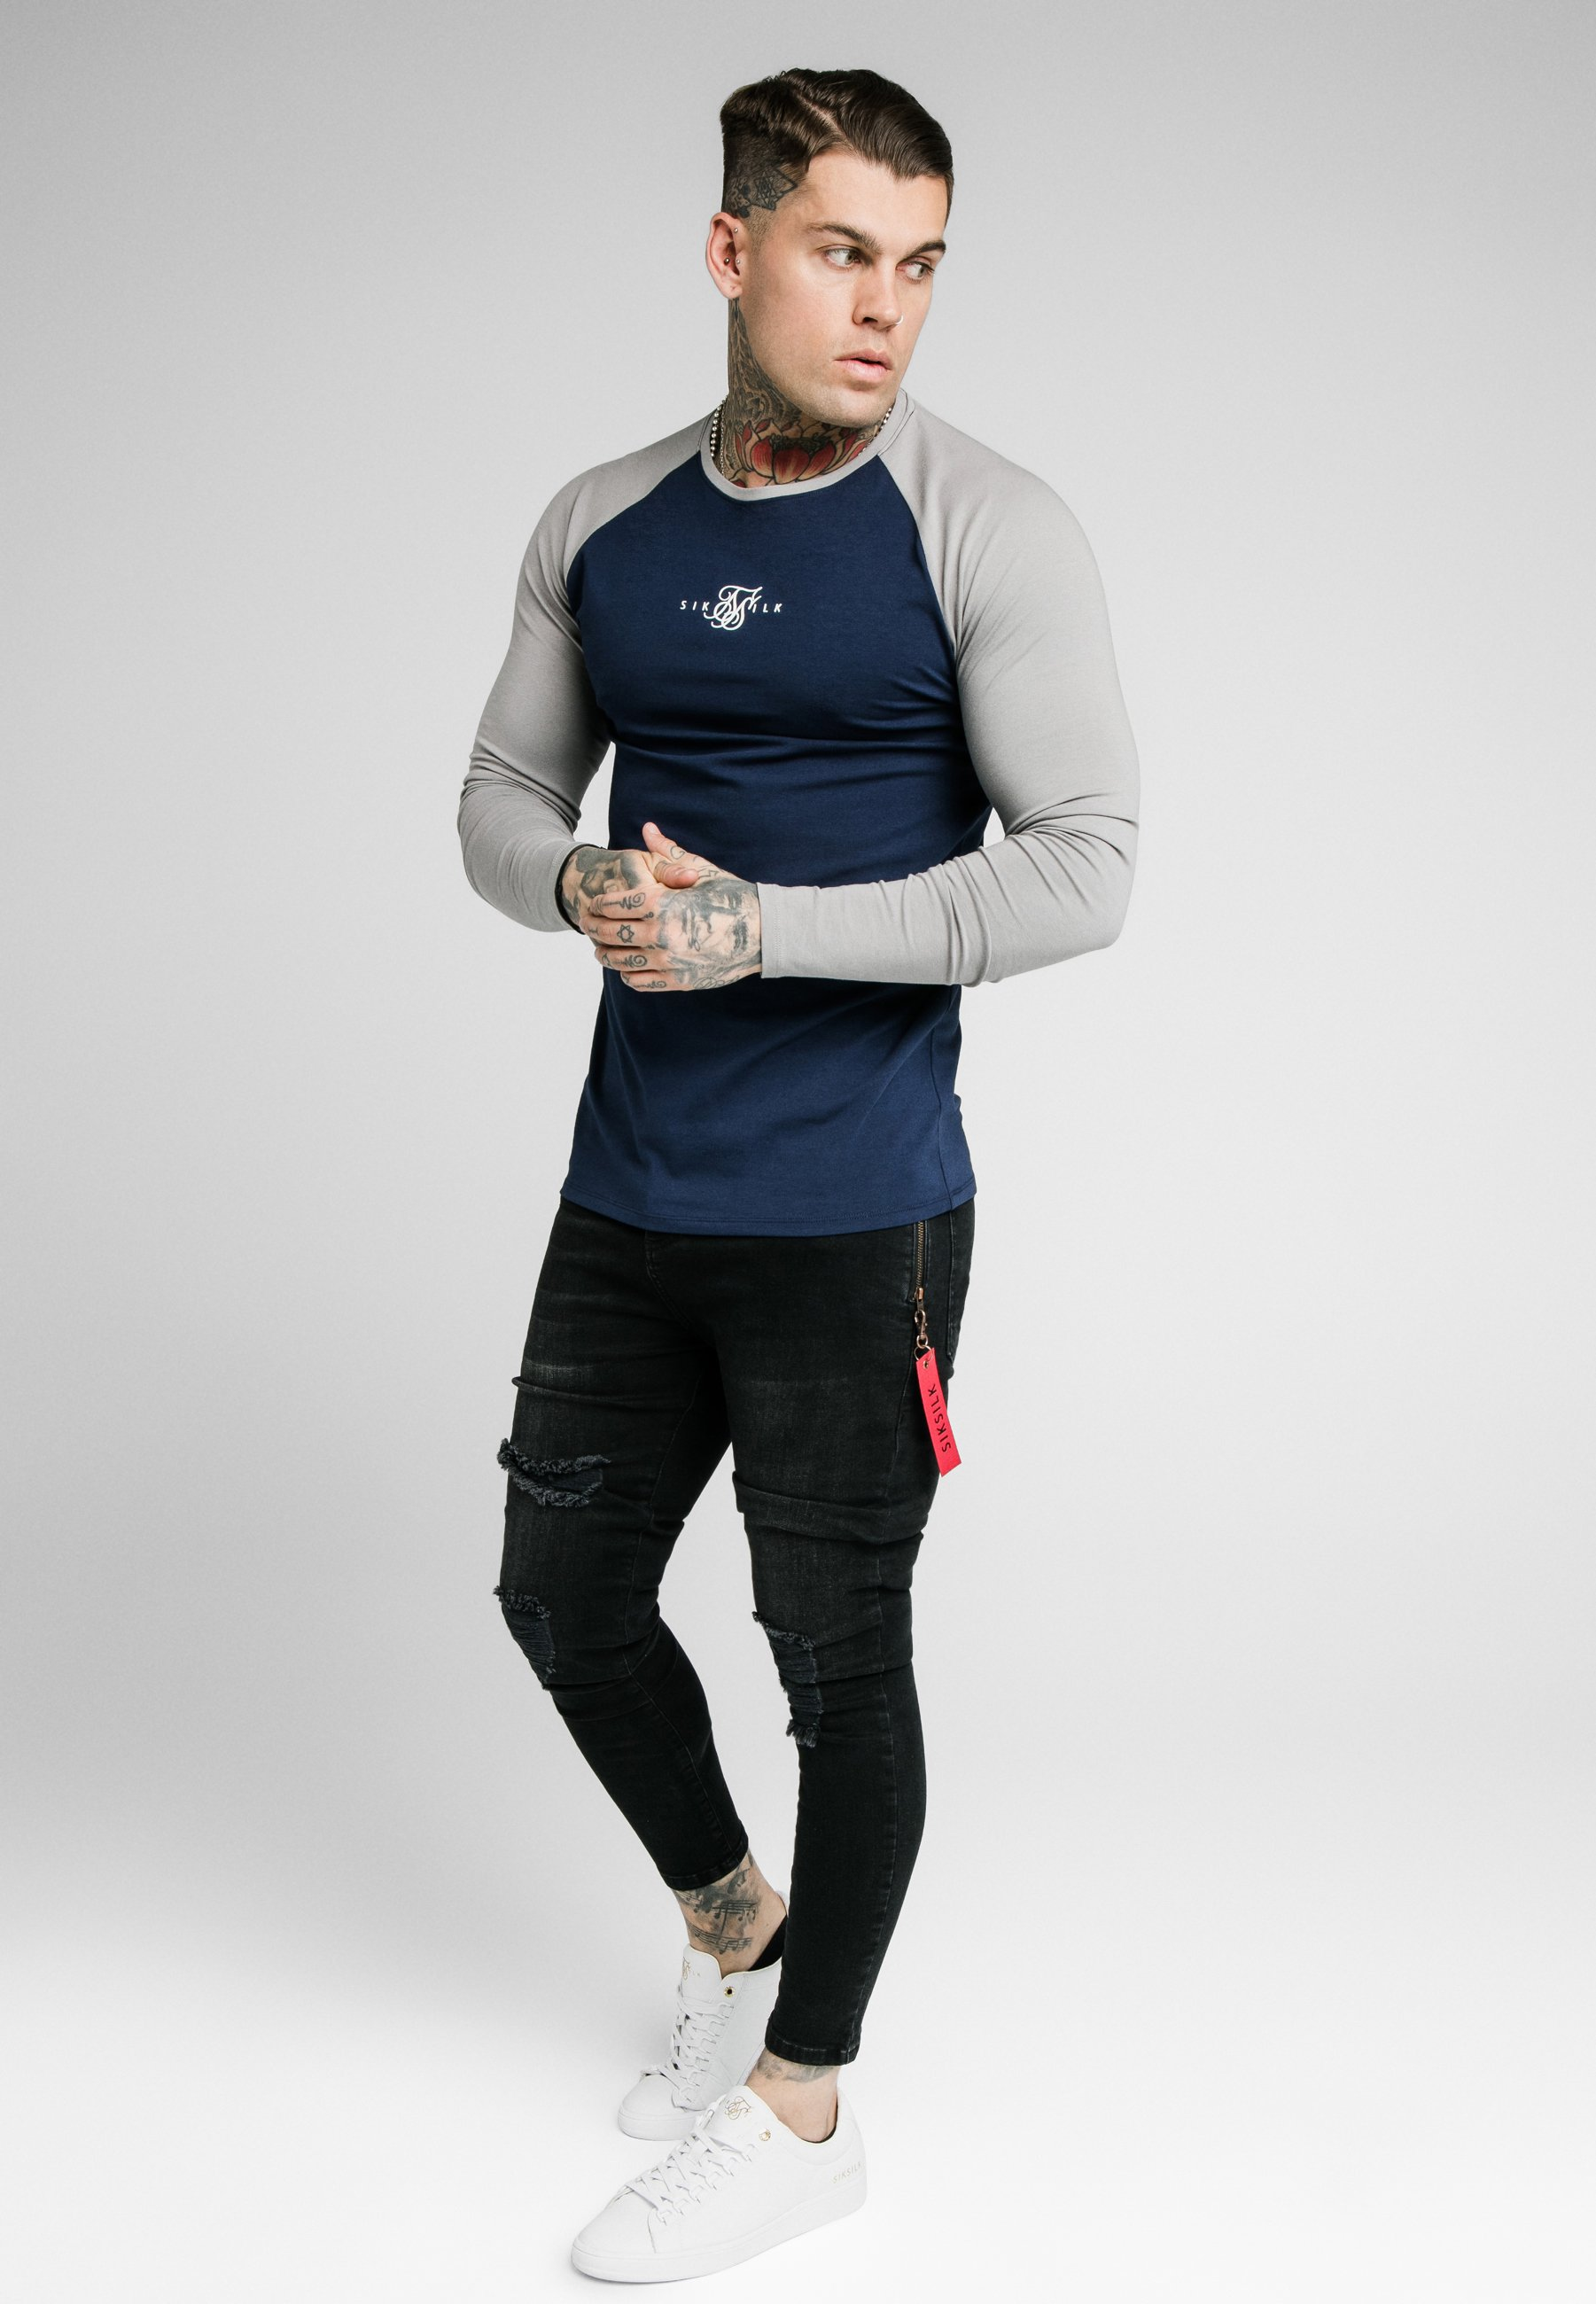 Siksilk Square Hem Tee - Topper Langermet Grey/navy/grå